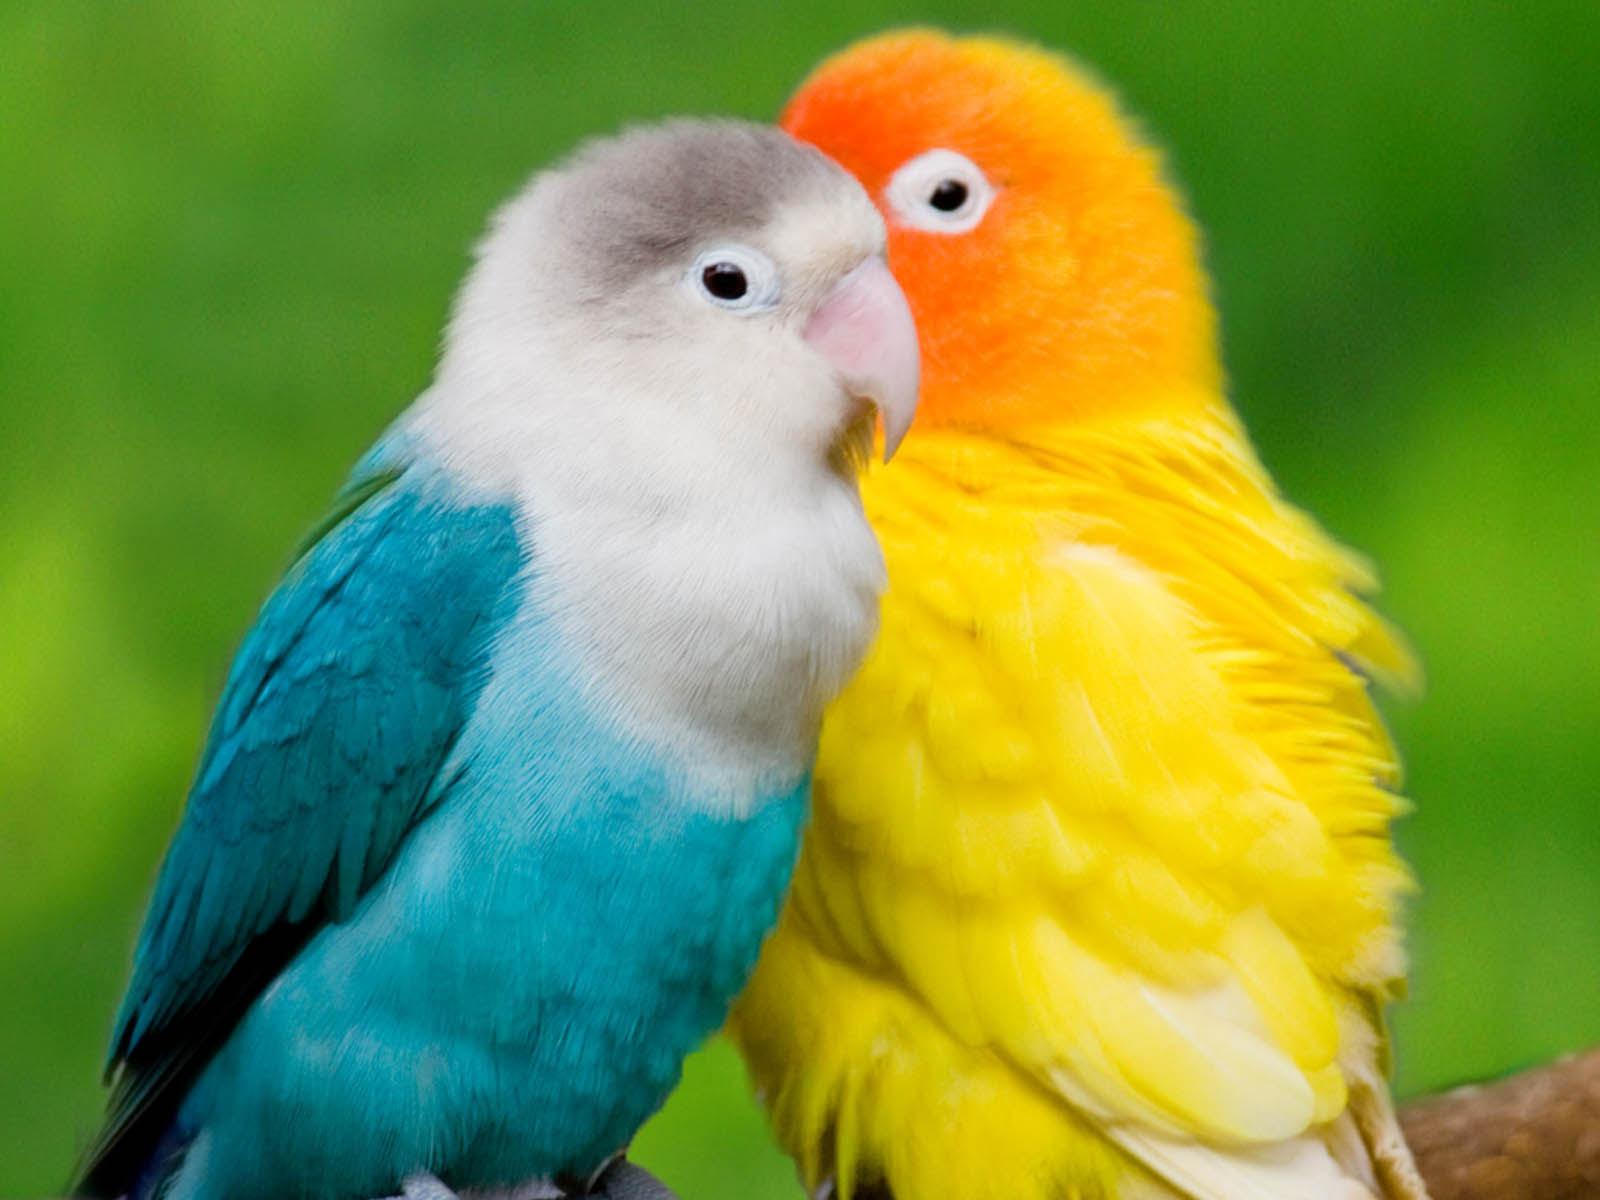 parrots wallpaper bird - photo #8